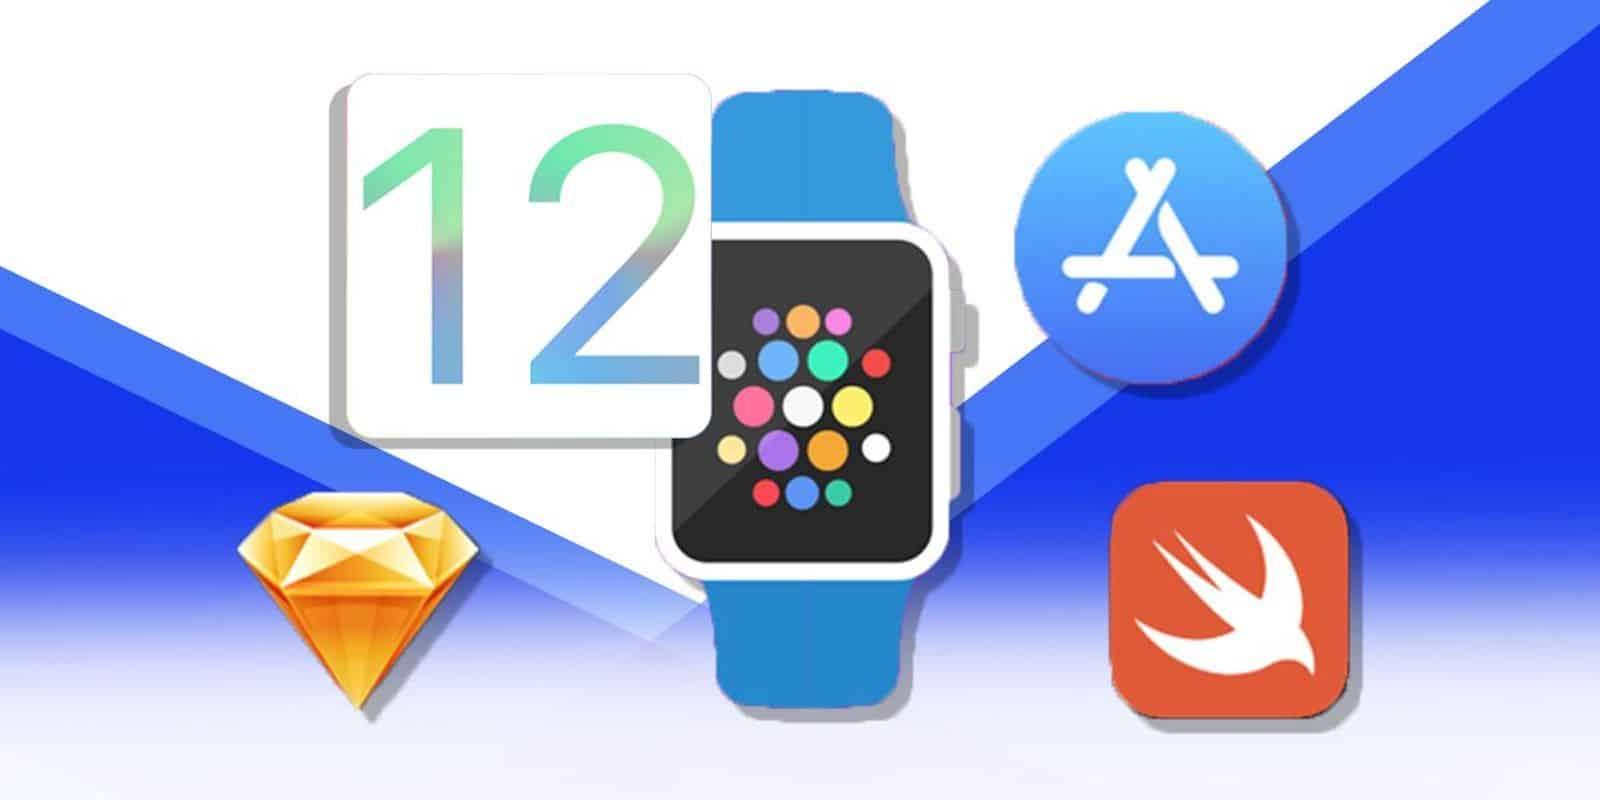 iOS 12 Bundle